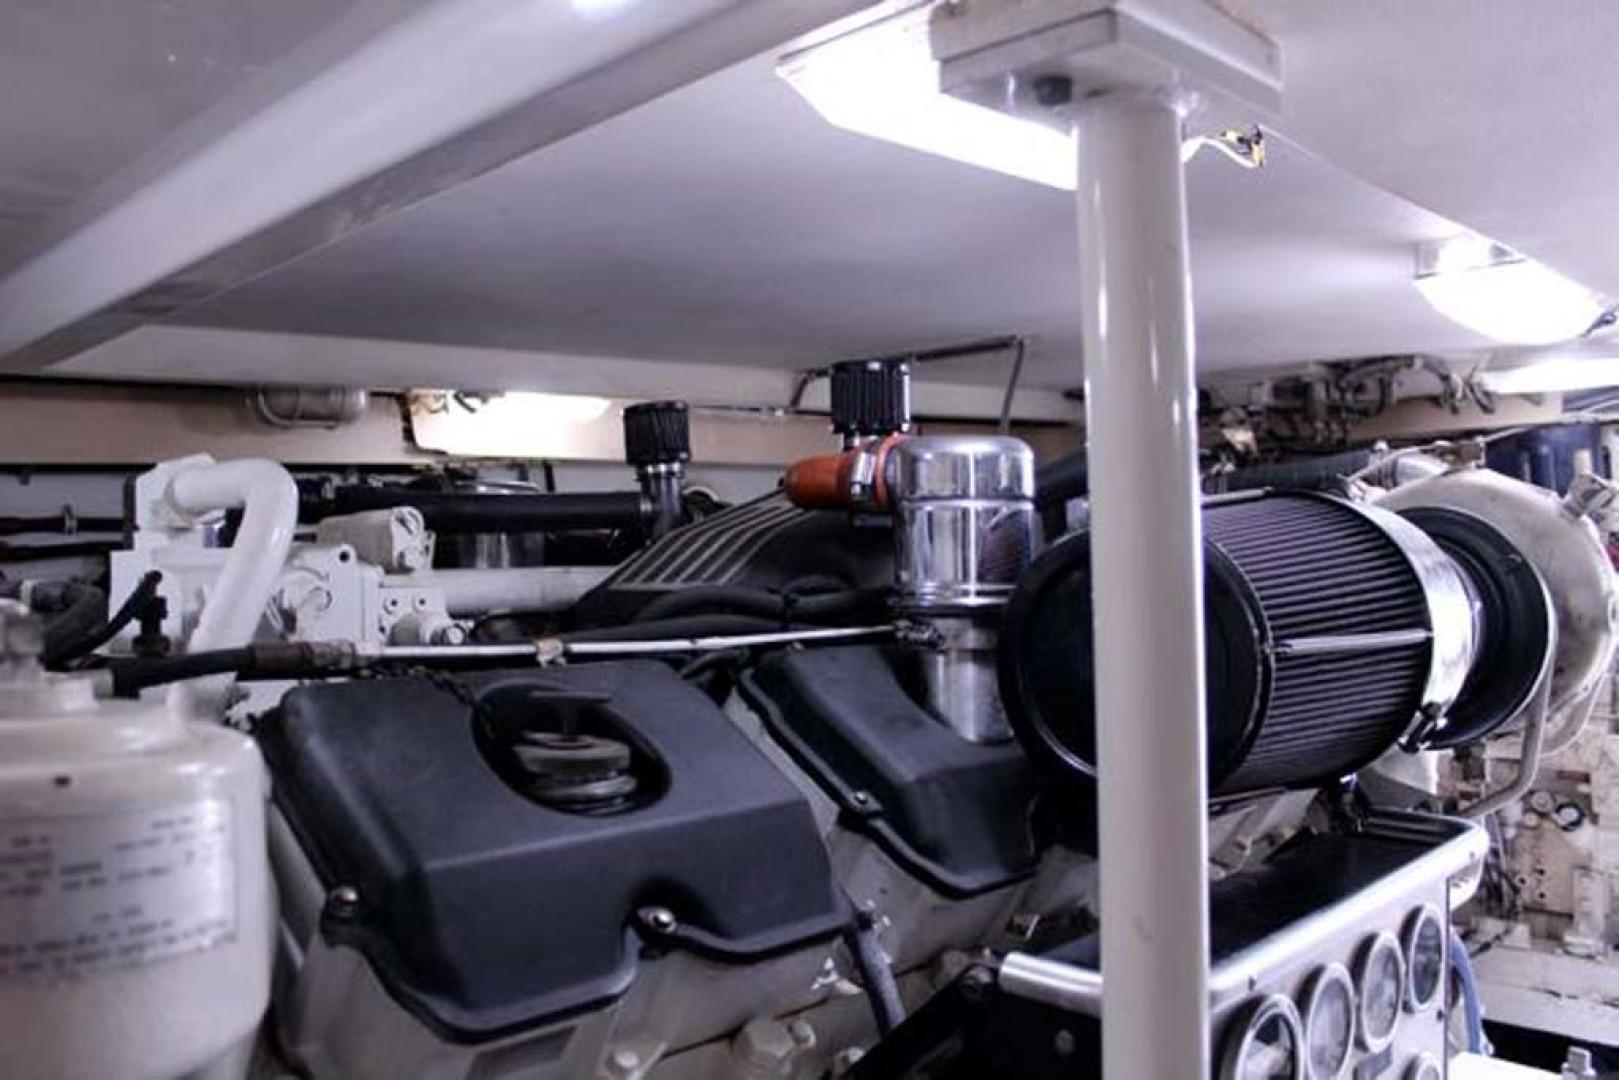 Bertram-54 Convertible 2000-Reel Healin Lighthouse Point-Florida-United States-Engine Room lll-1065943 | Thumbnail